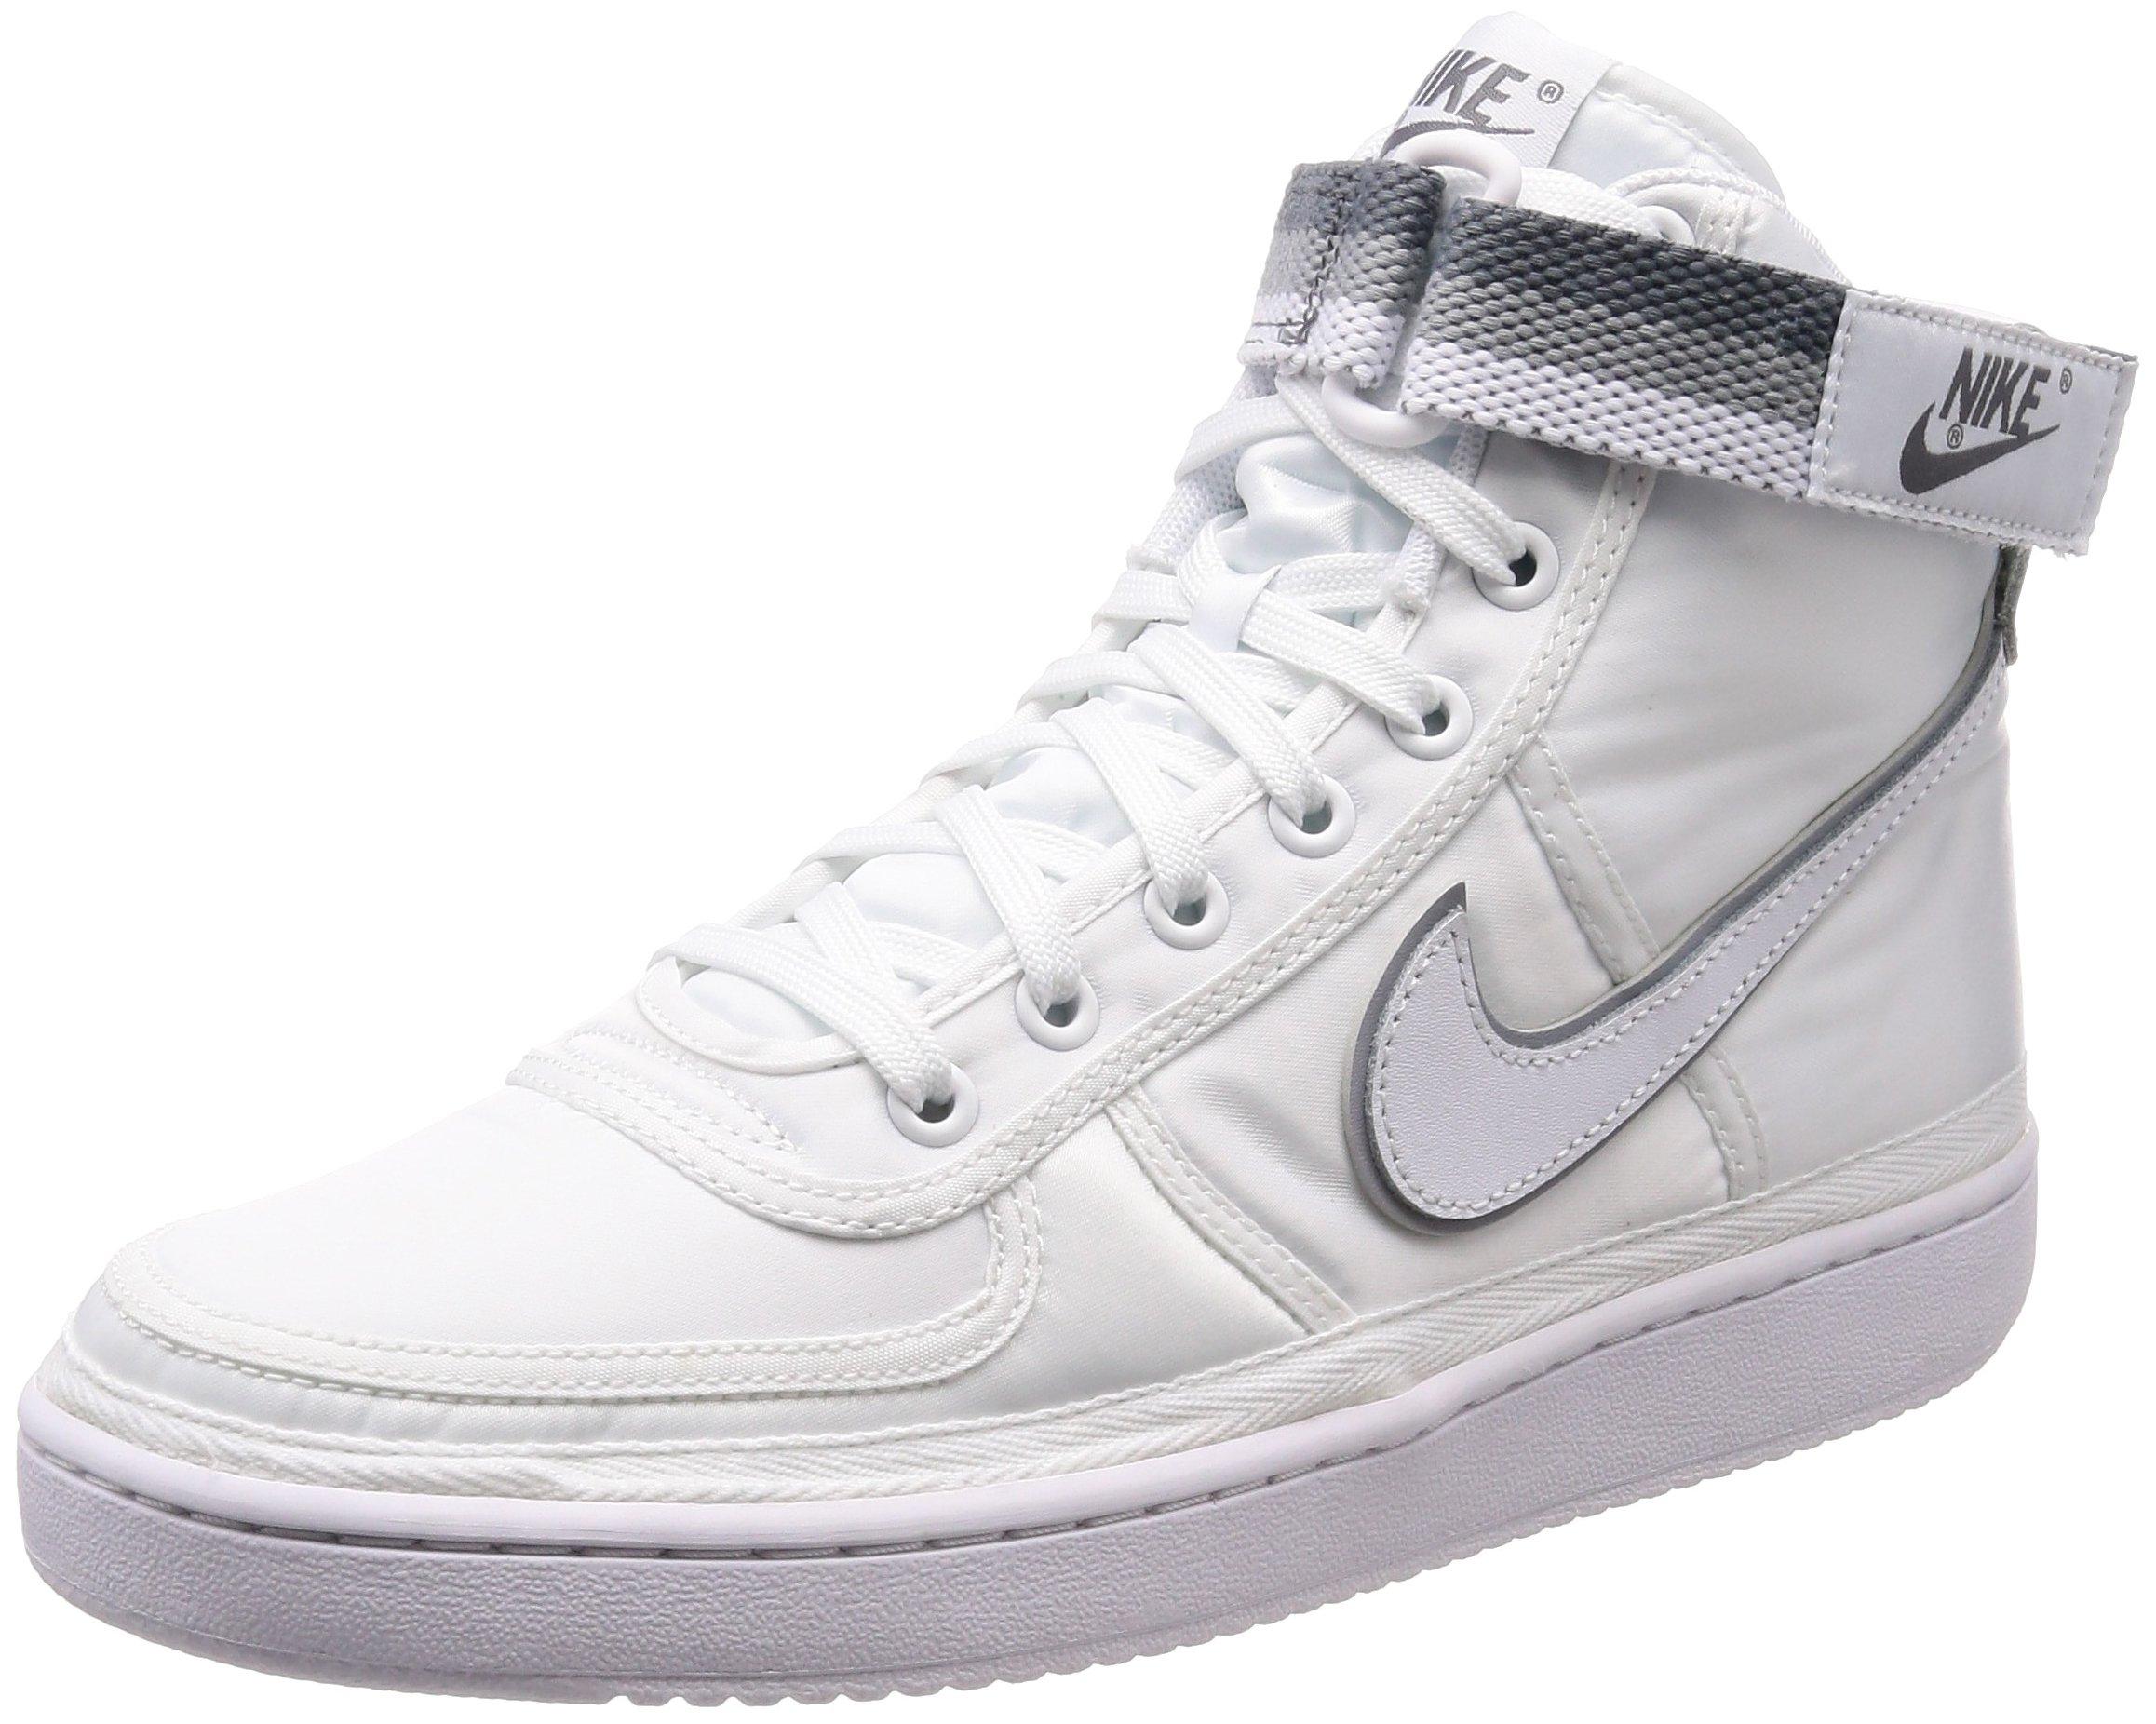 0aea3fec372bbc Galleon - Nike Vandal High Supreme Men s Basketball Shoes 318330-100 (8)